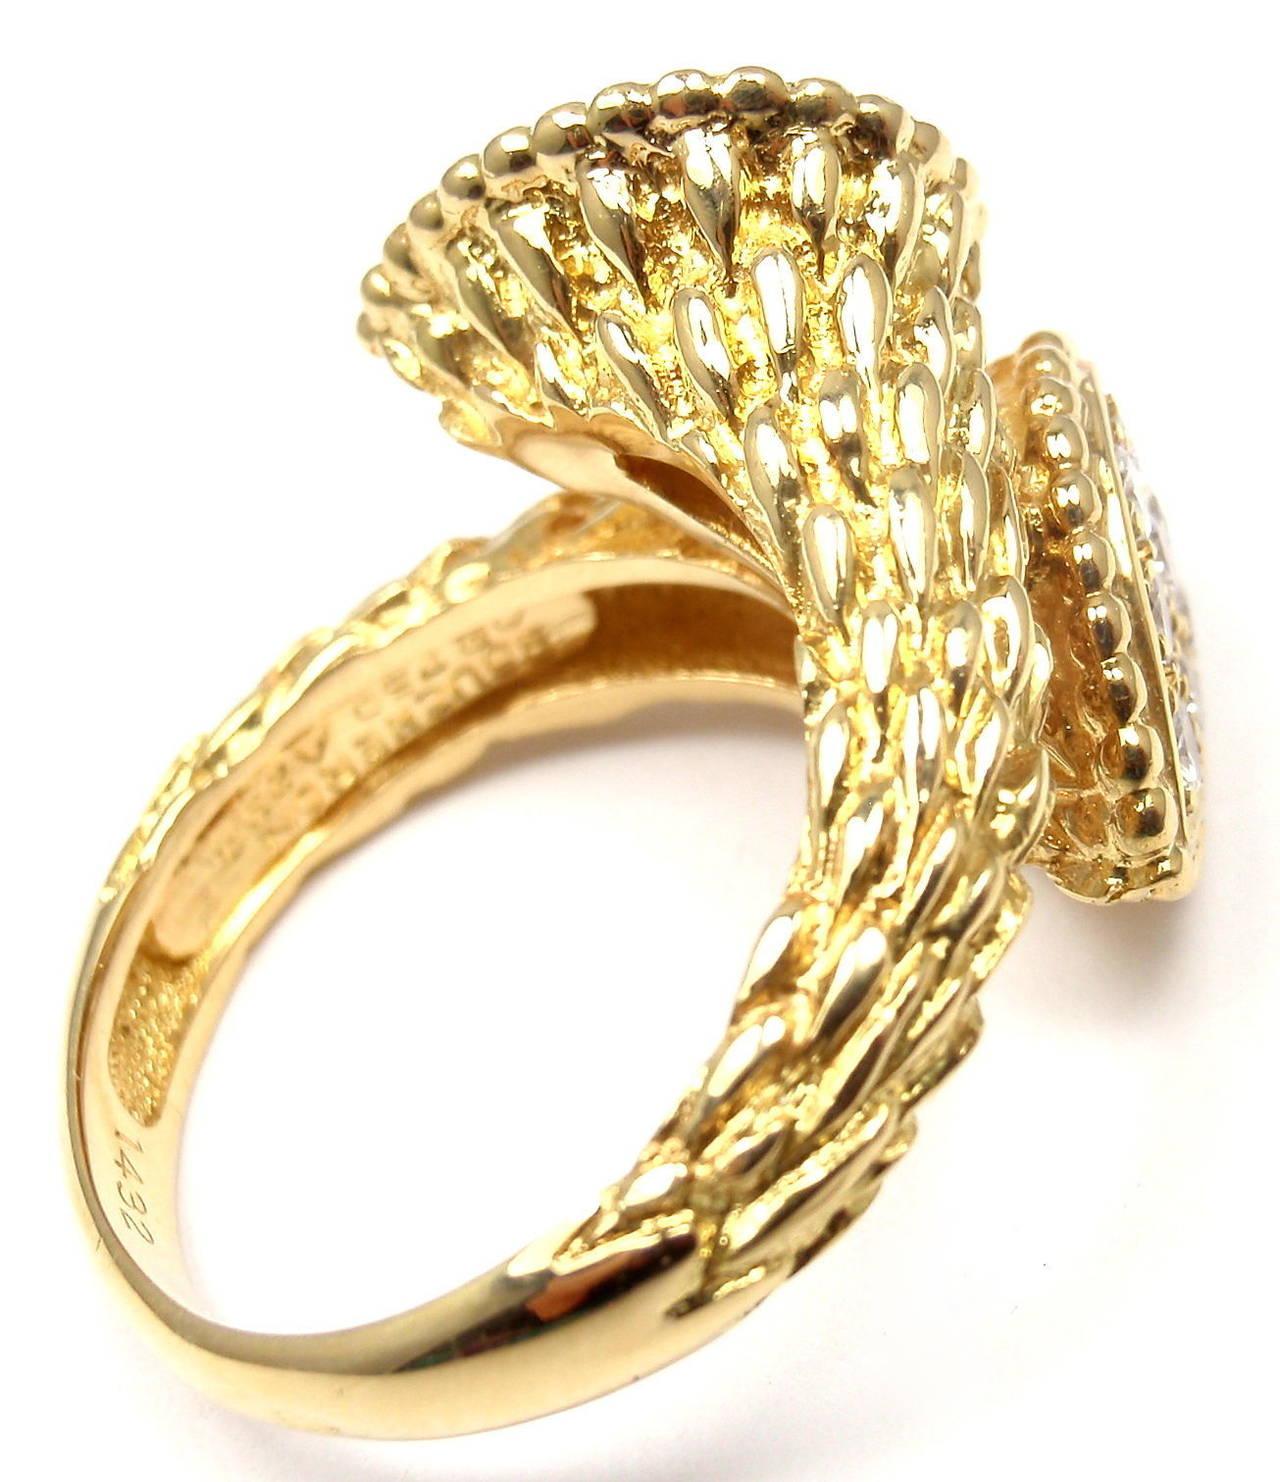 Boucheron Serpent Bohème Toi et Moi Diamond Gold Ring at 1stdibs